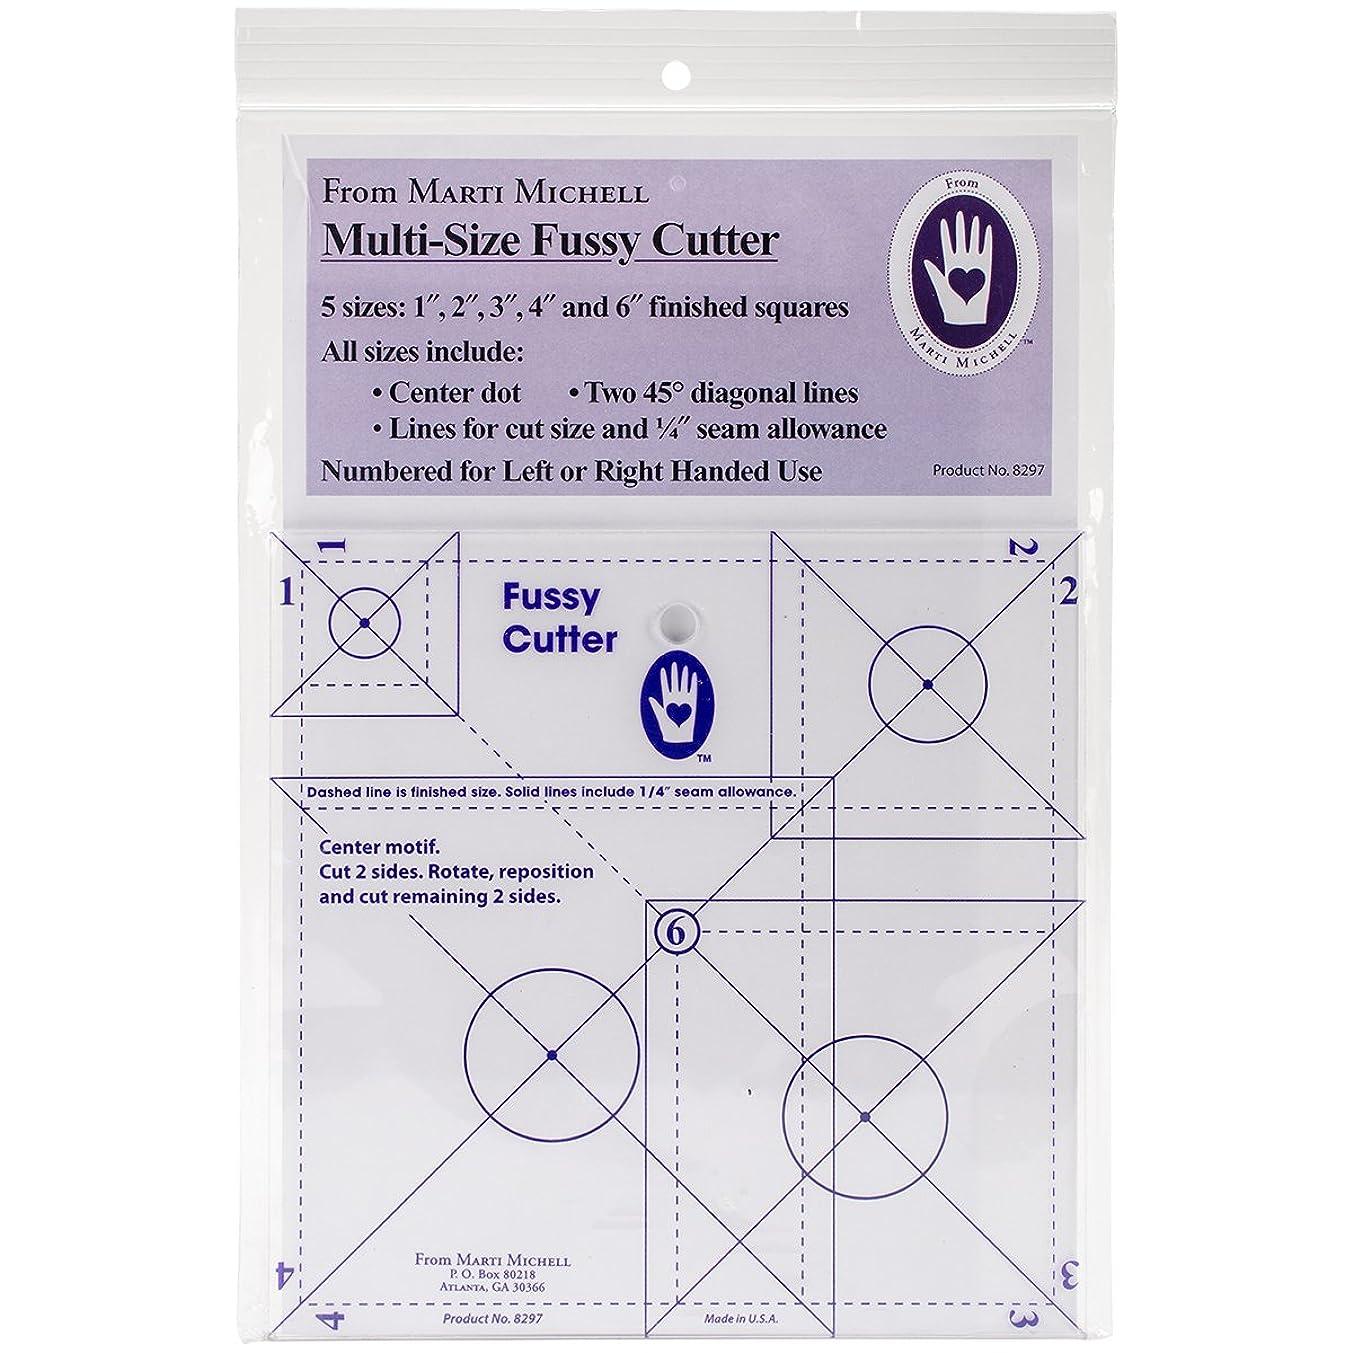 Marti Michell 8297 Multisize Fussy Cutter Ruler